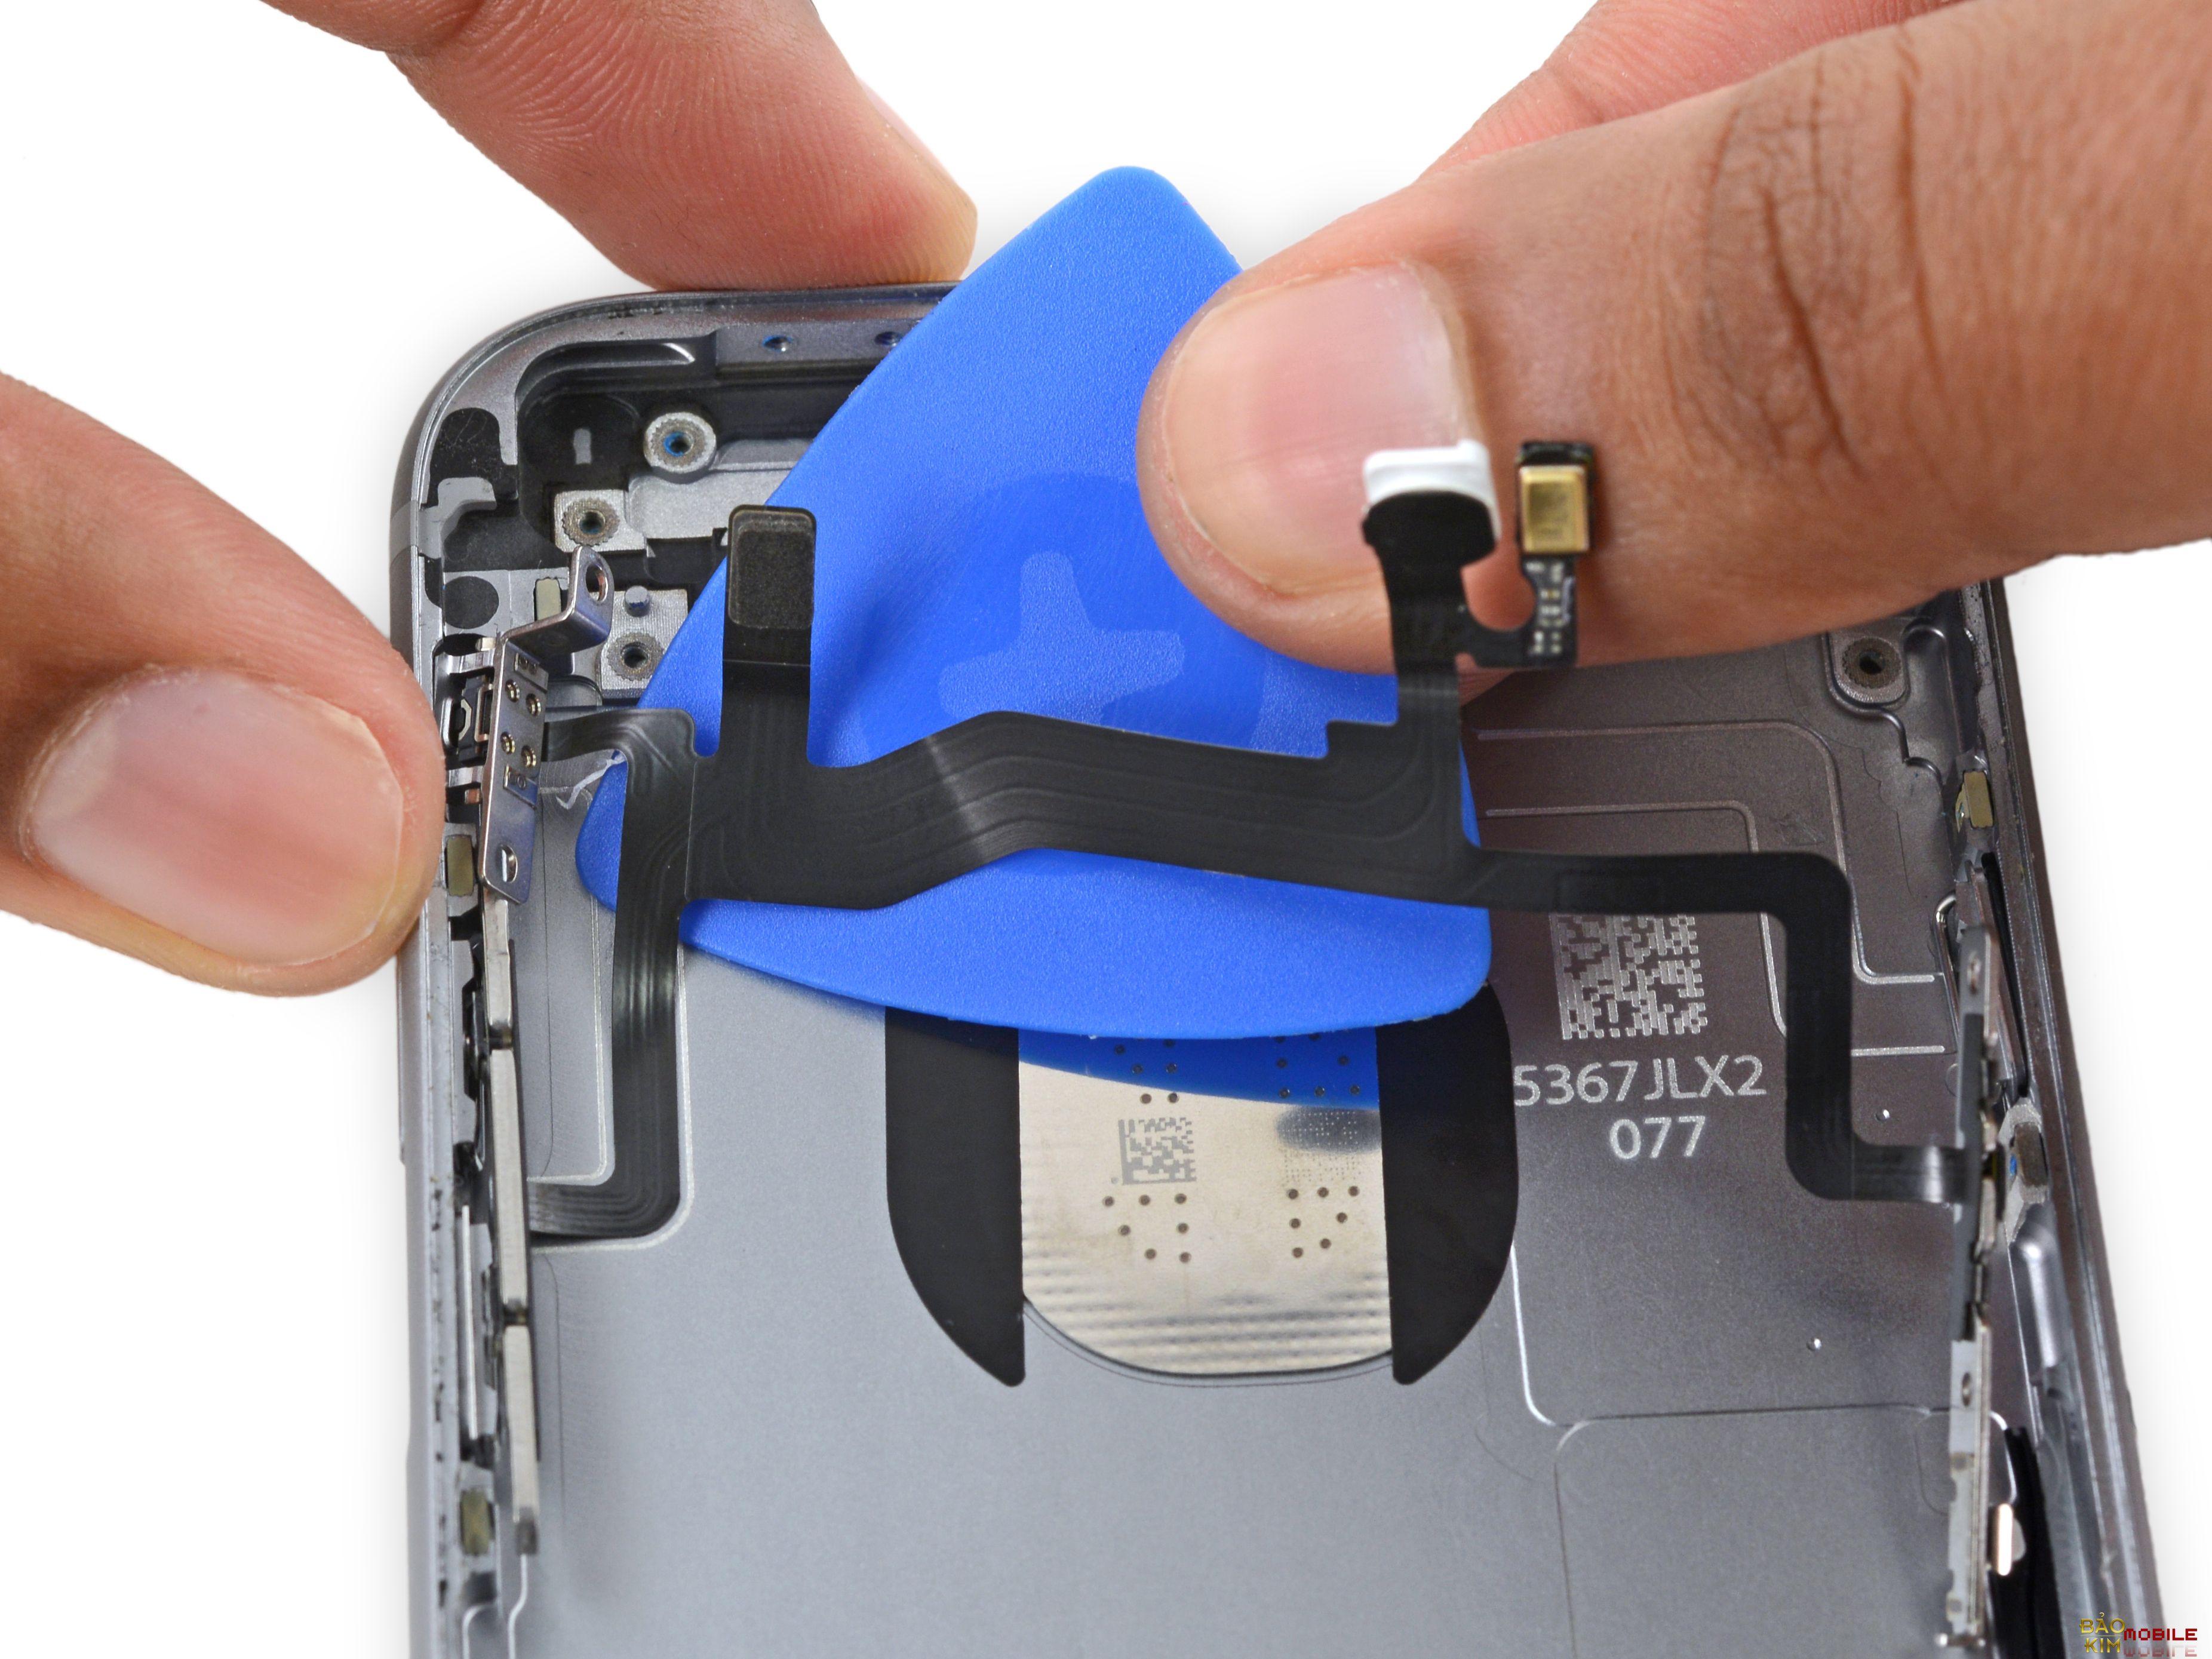 Thay nút gạt rung iPhone 6, 6 Plus